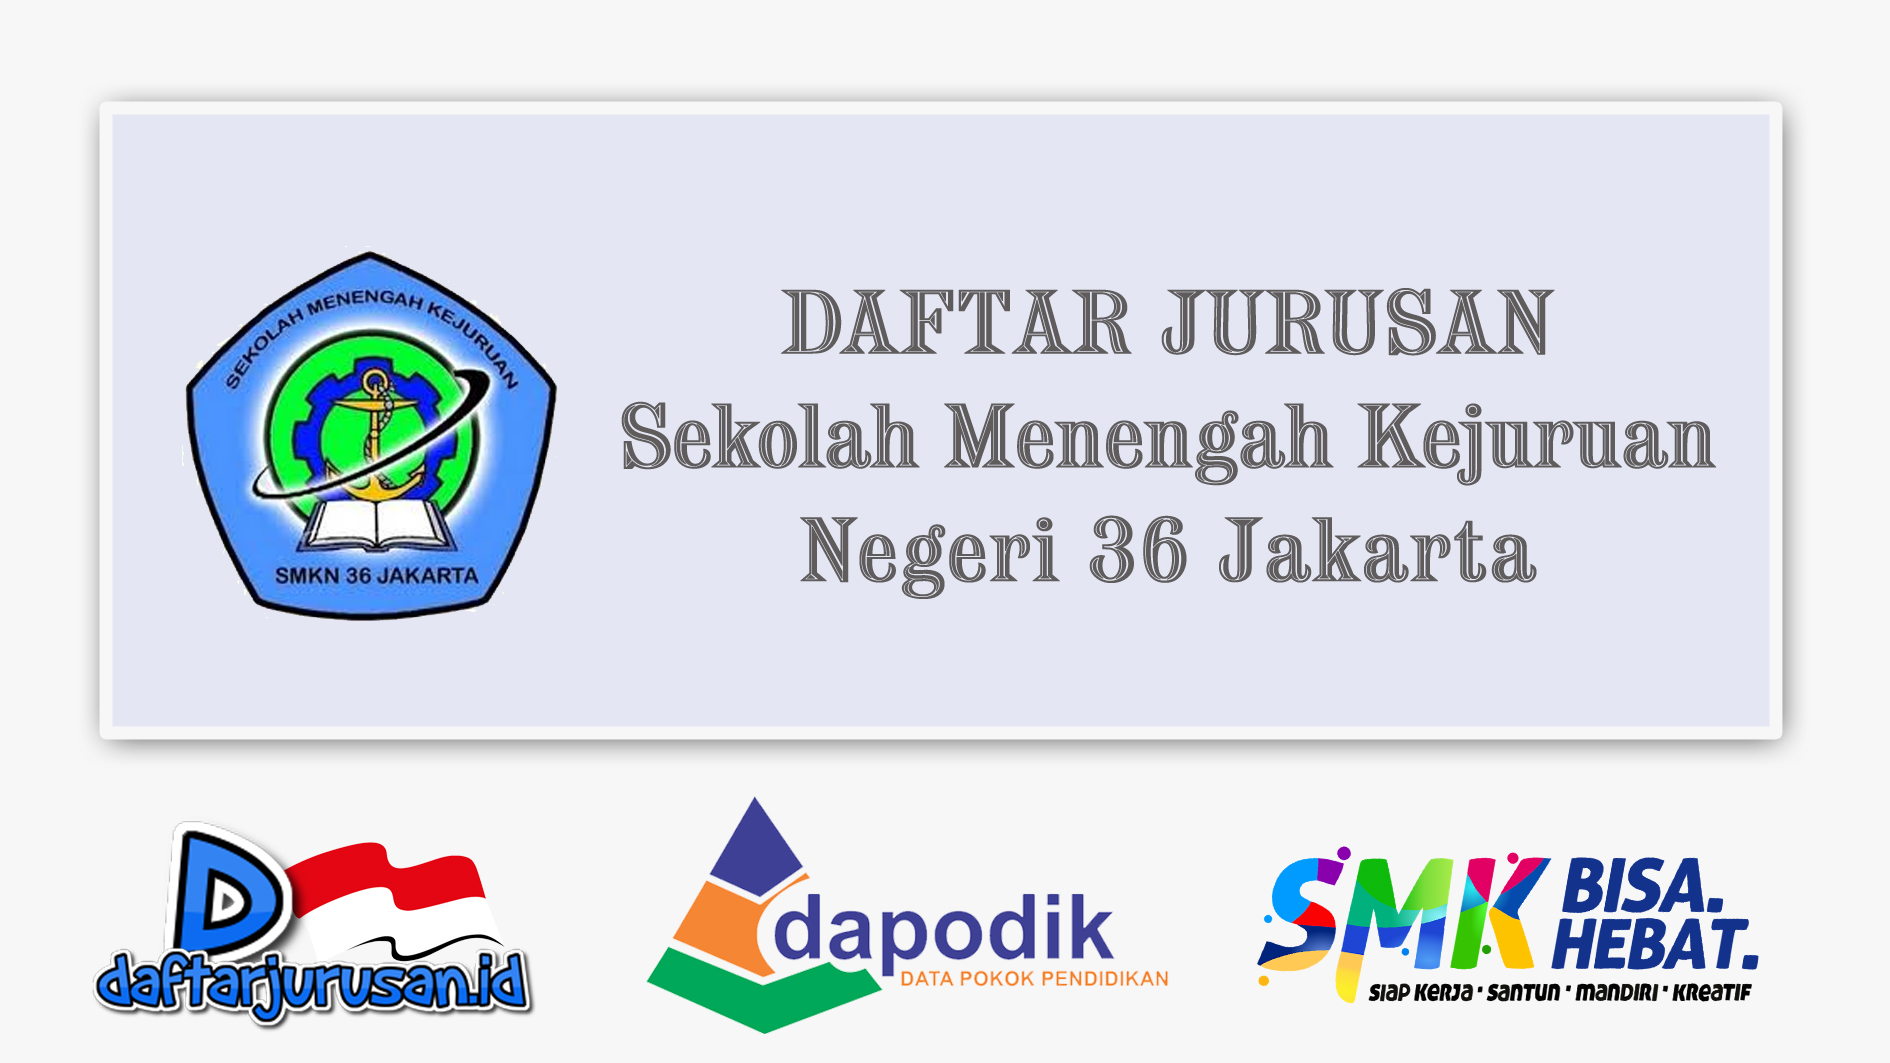 Daftar Jurusan SMK Negeri 36 Jakarta Utara